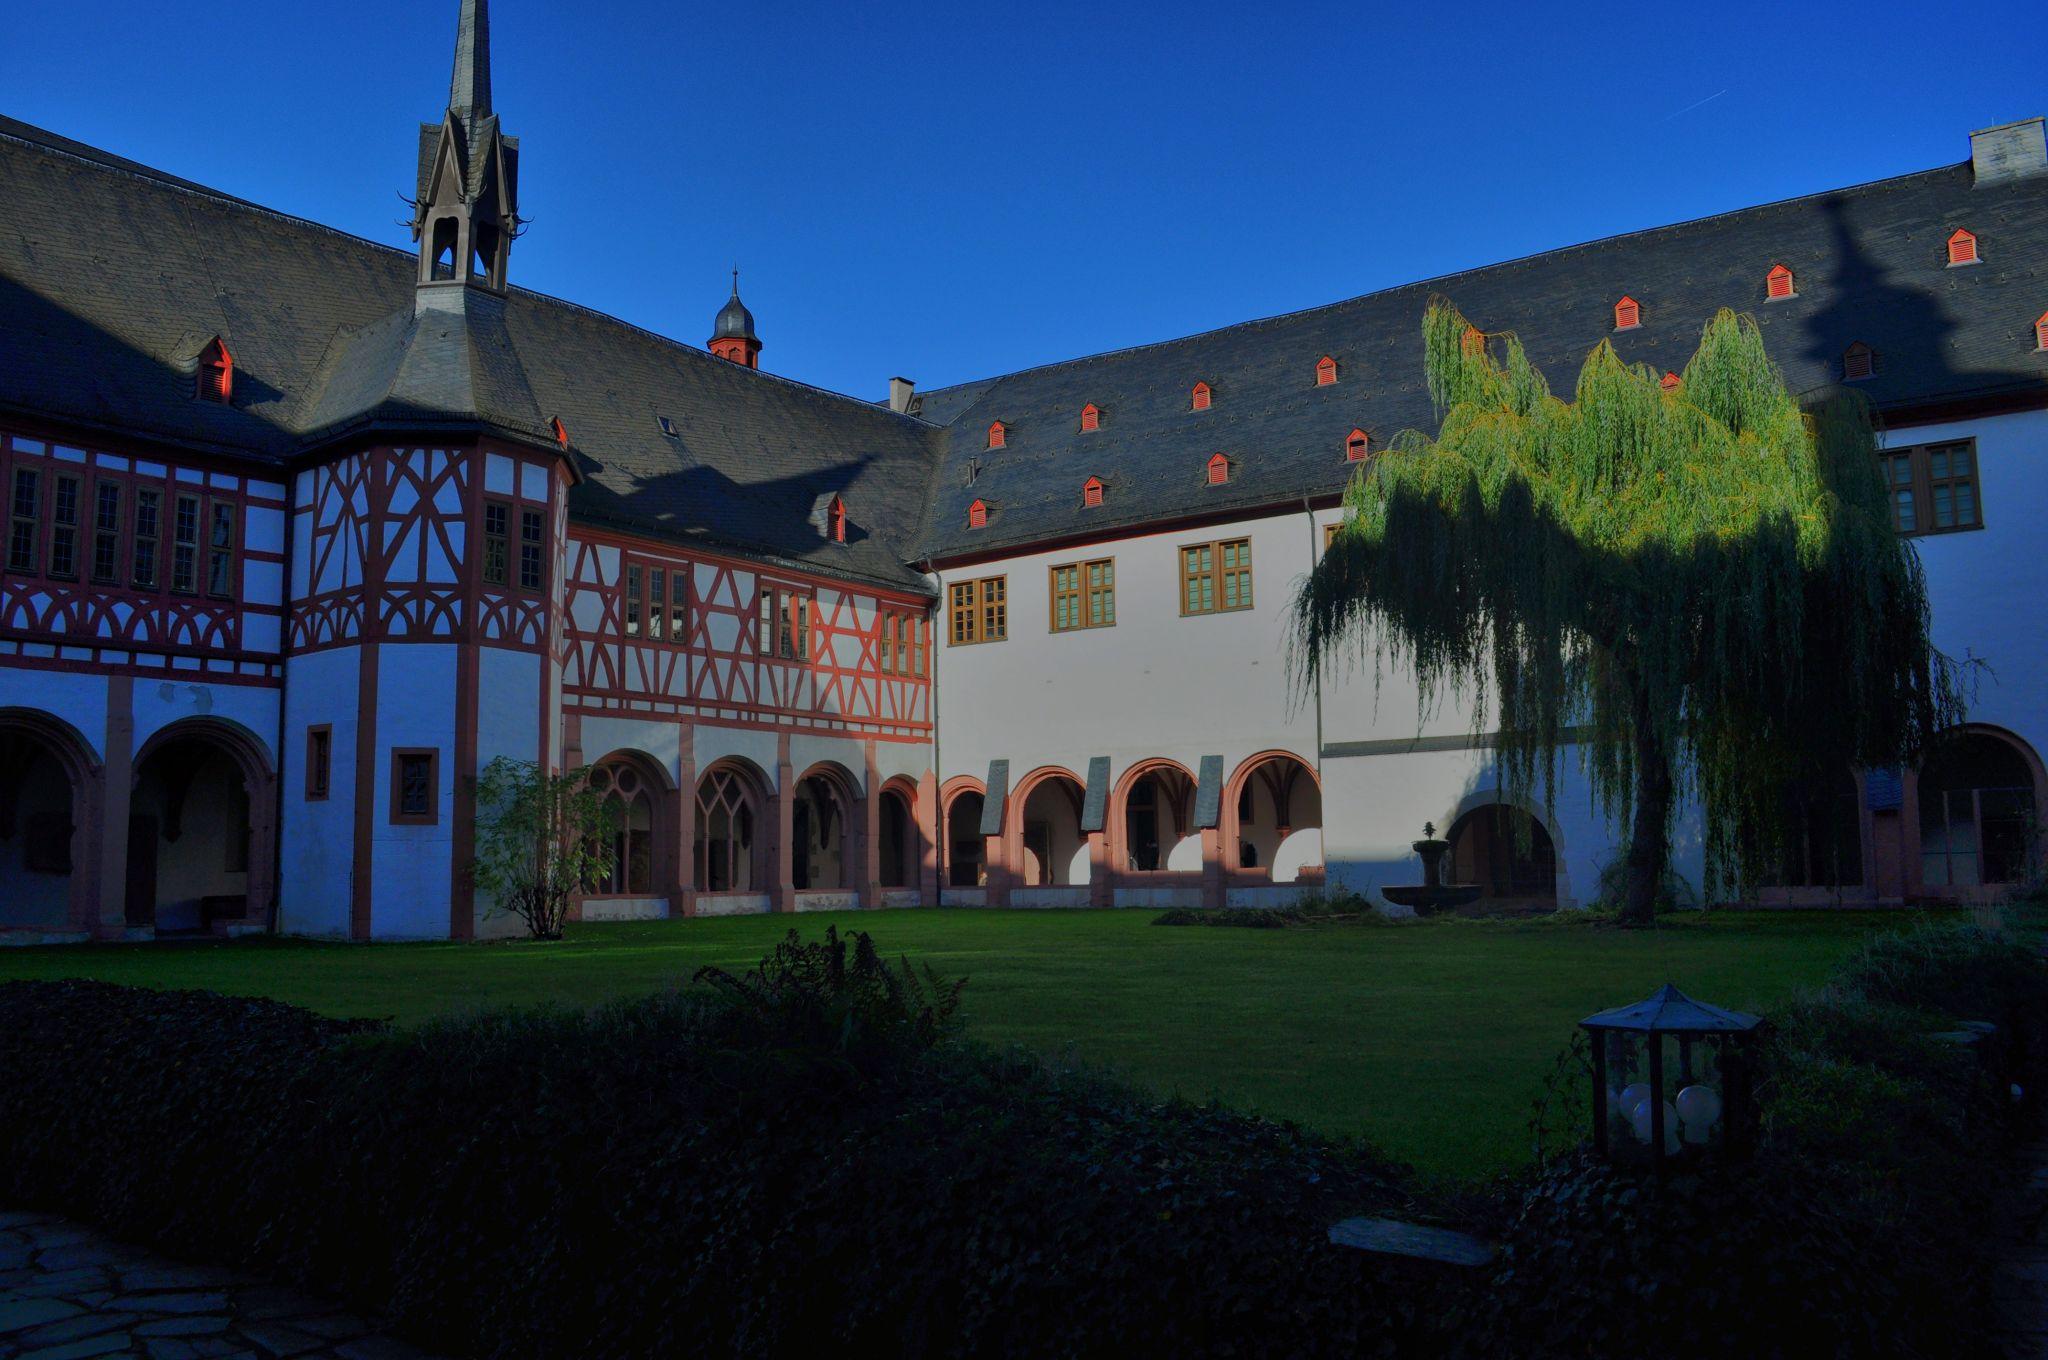 Kloster Eberbach, Germany